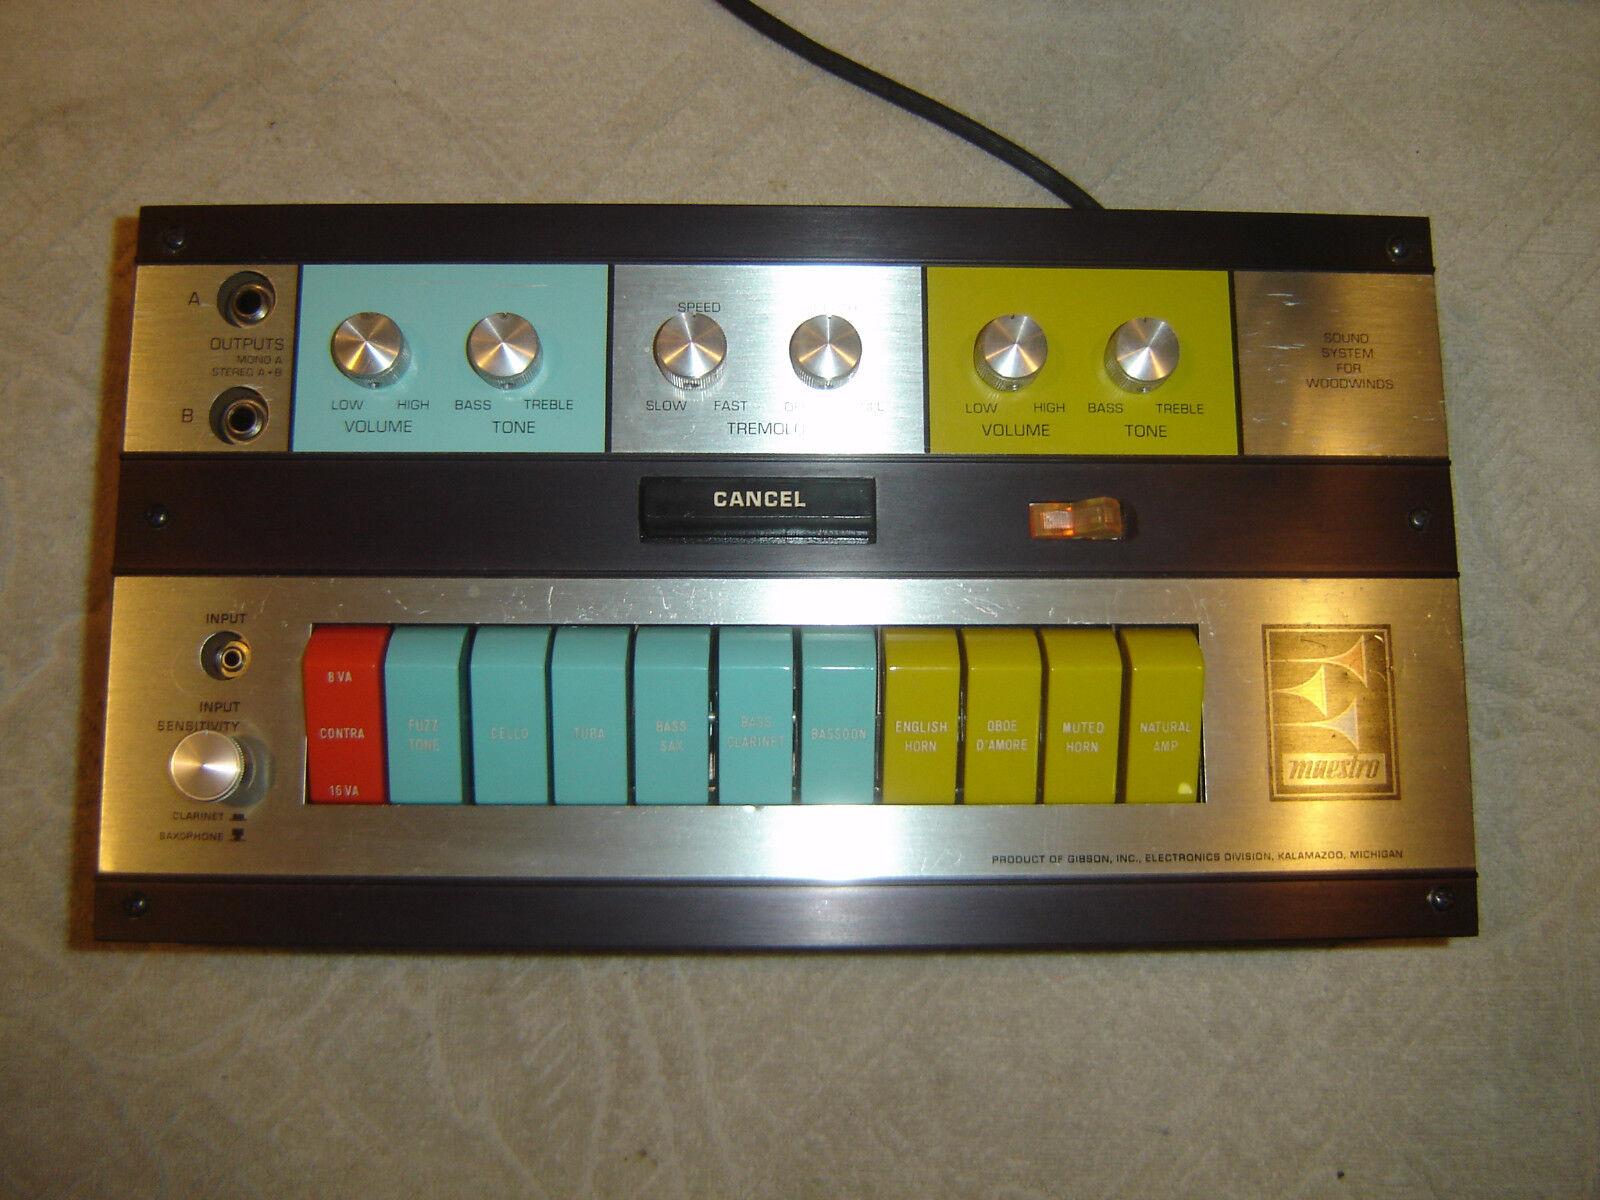 Gibson Maestro W2 W-2 Sound System for Woodwinds Vintage Unit Unit Unit a78b5b